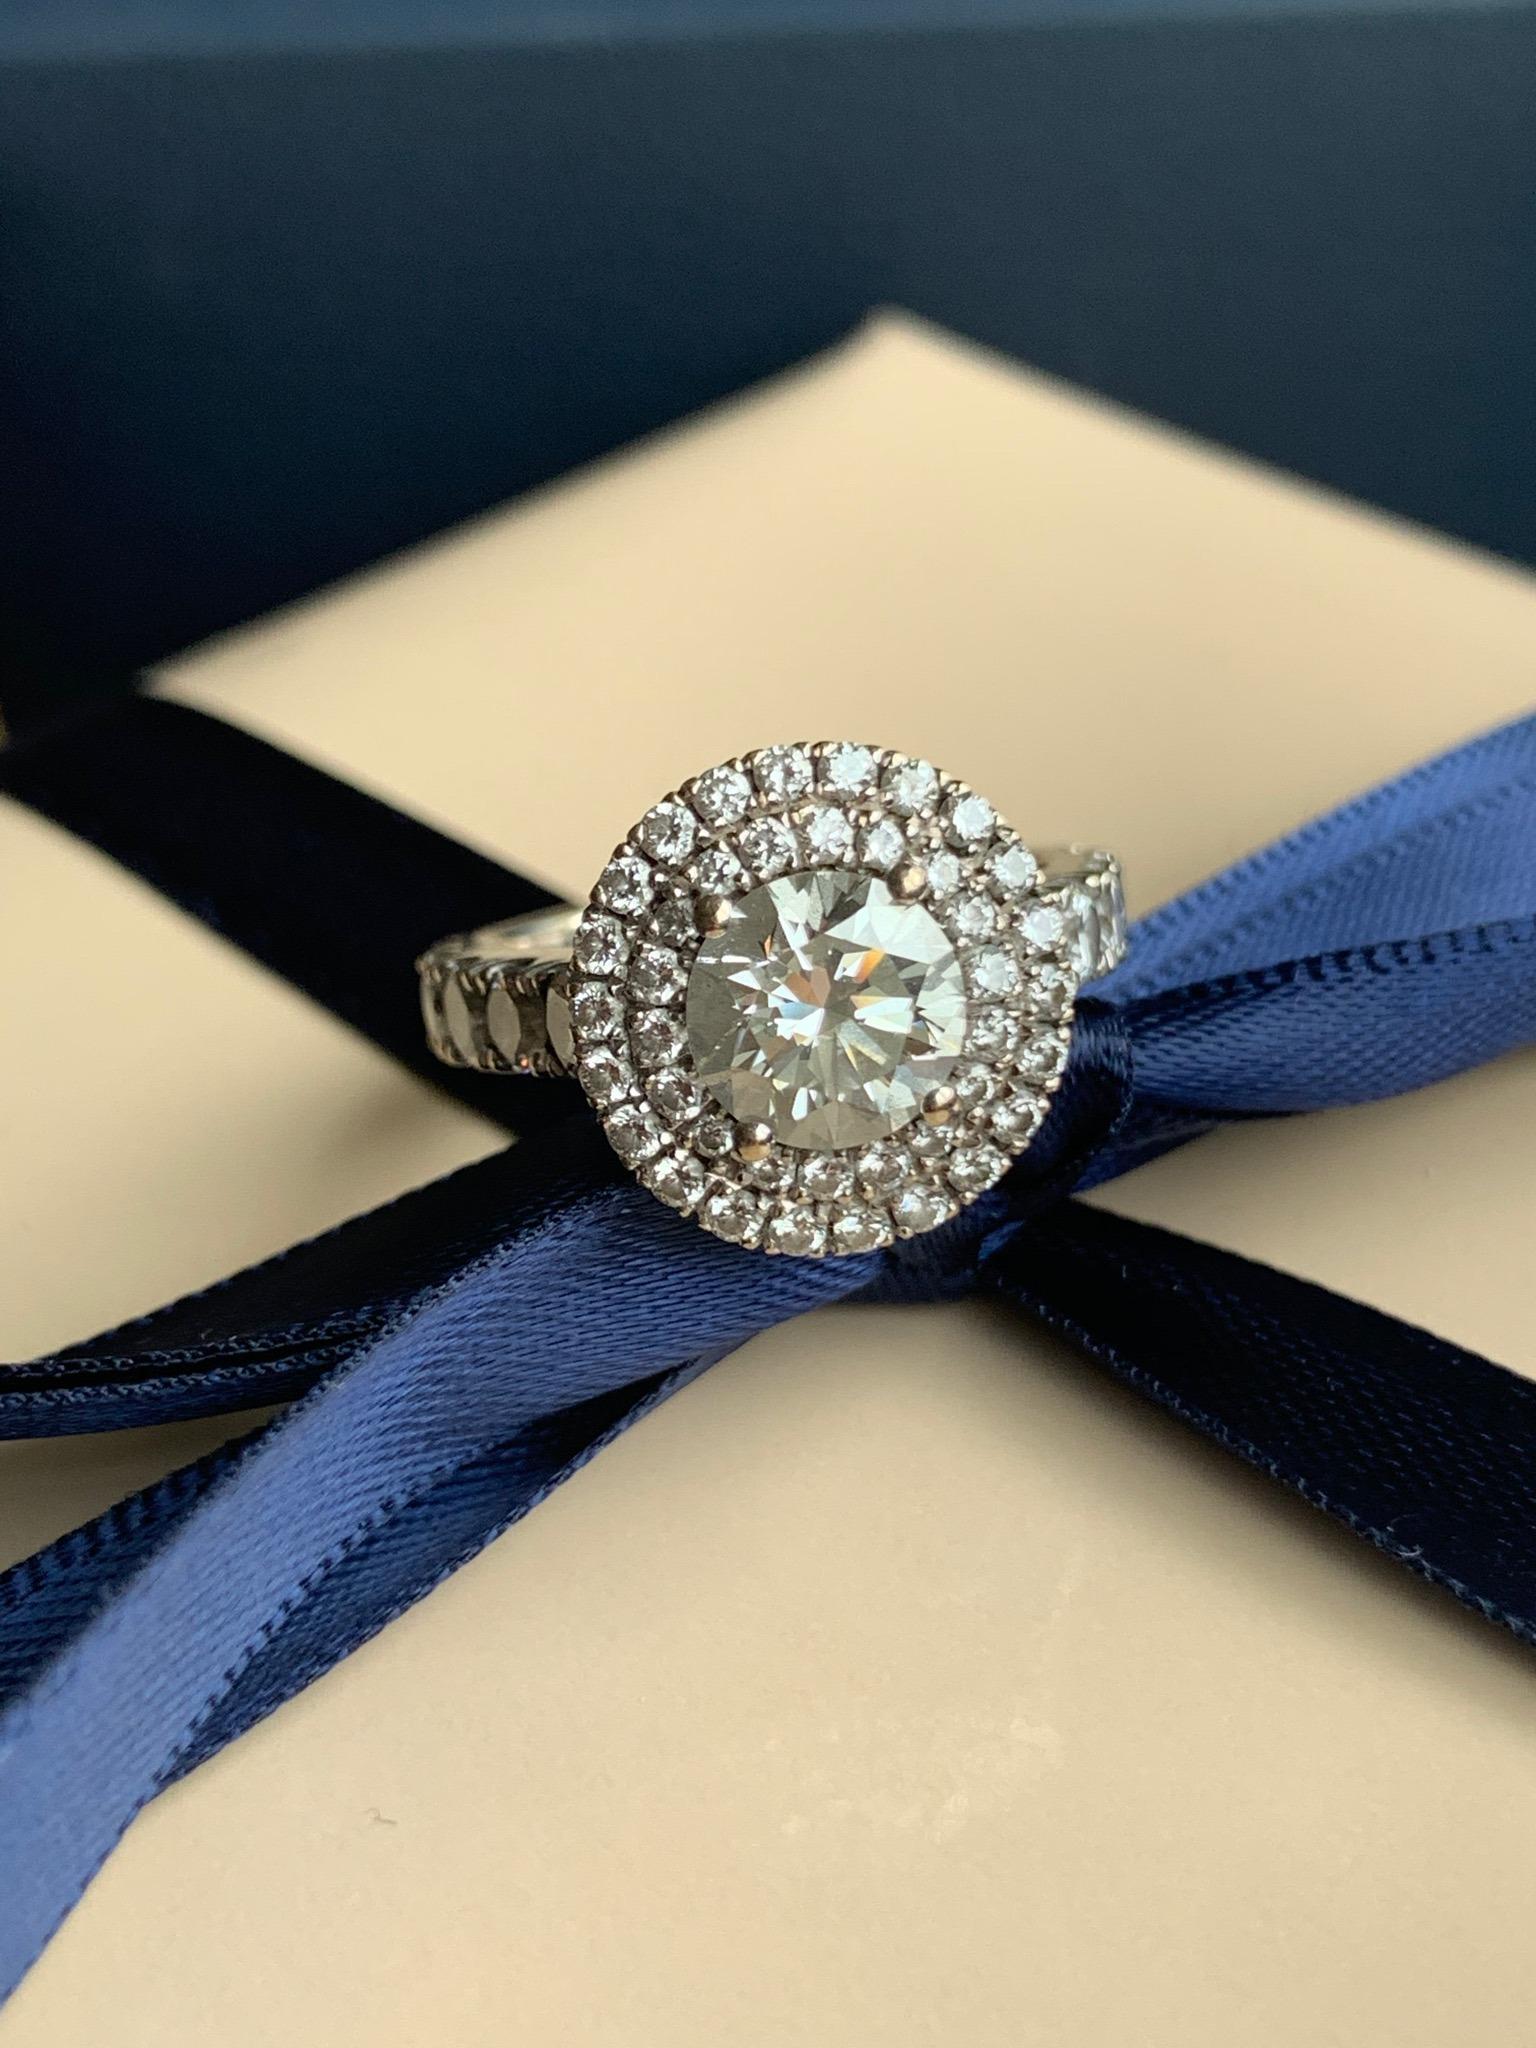 2 carat brilliant cut diamond set with double halo